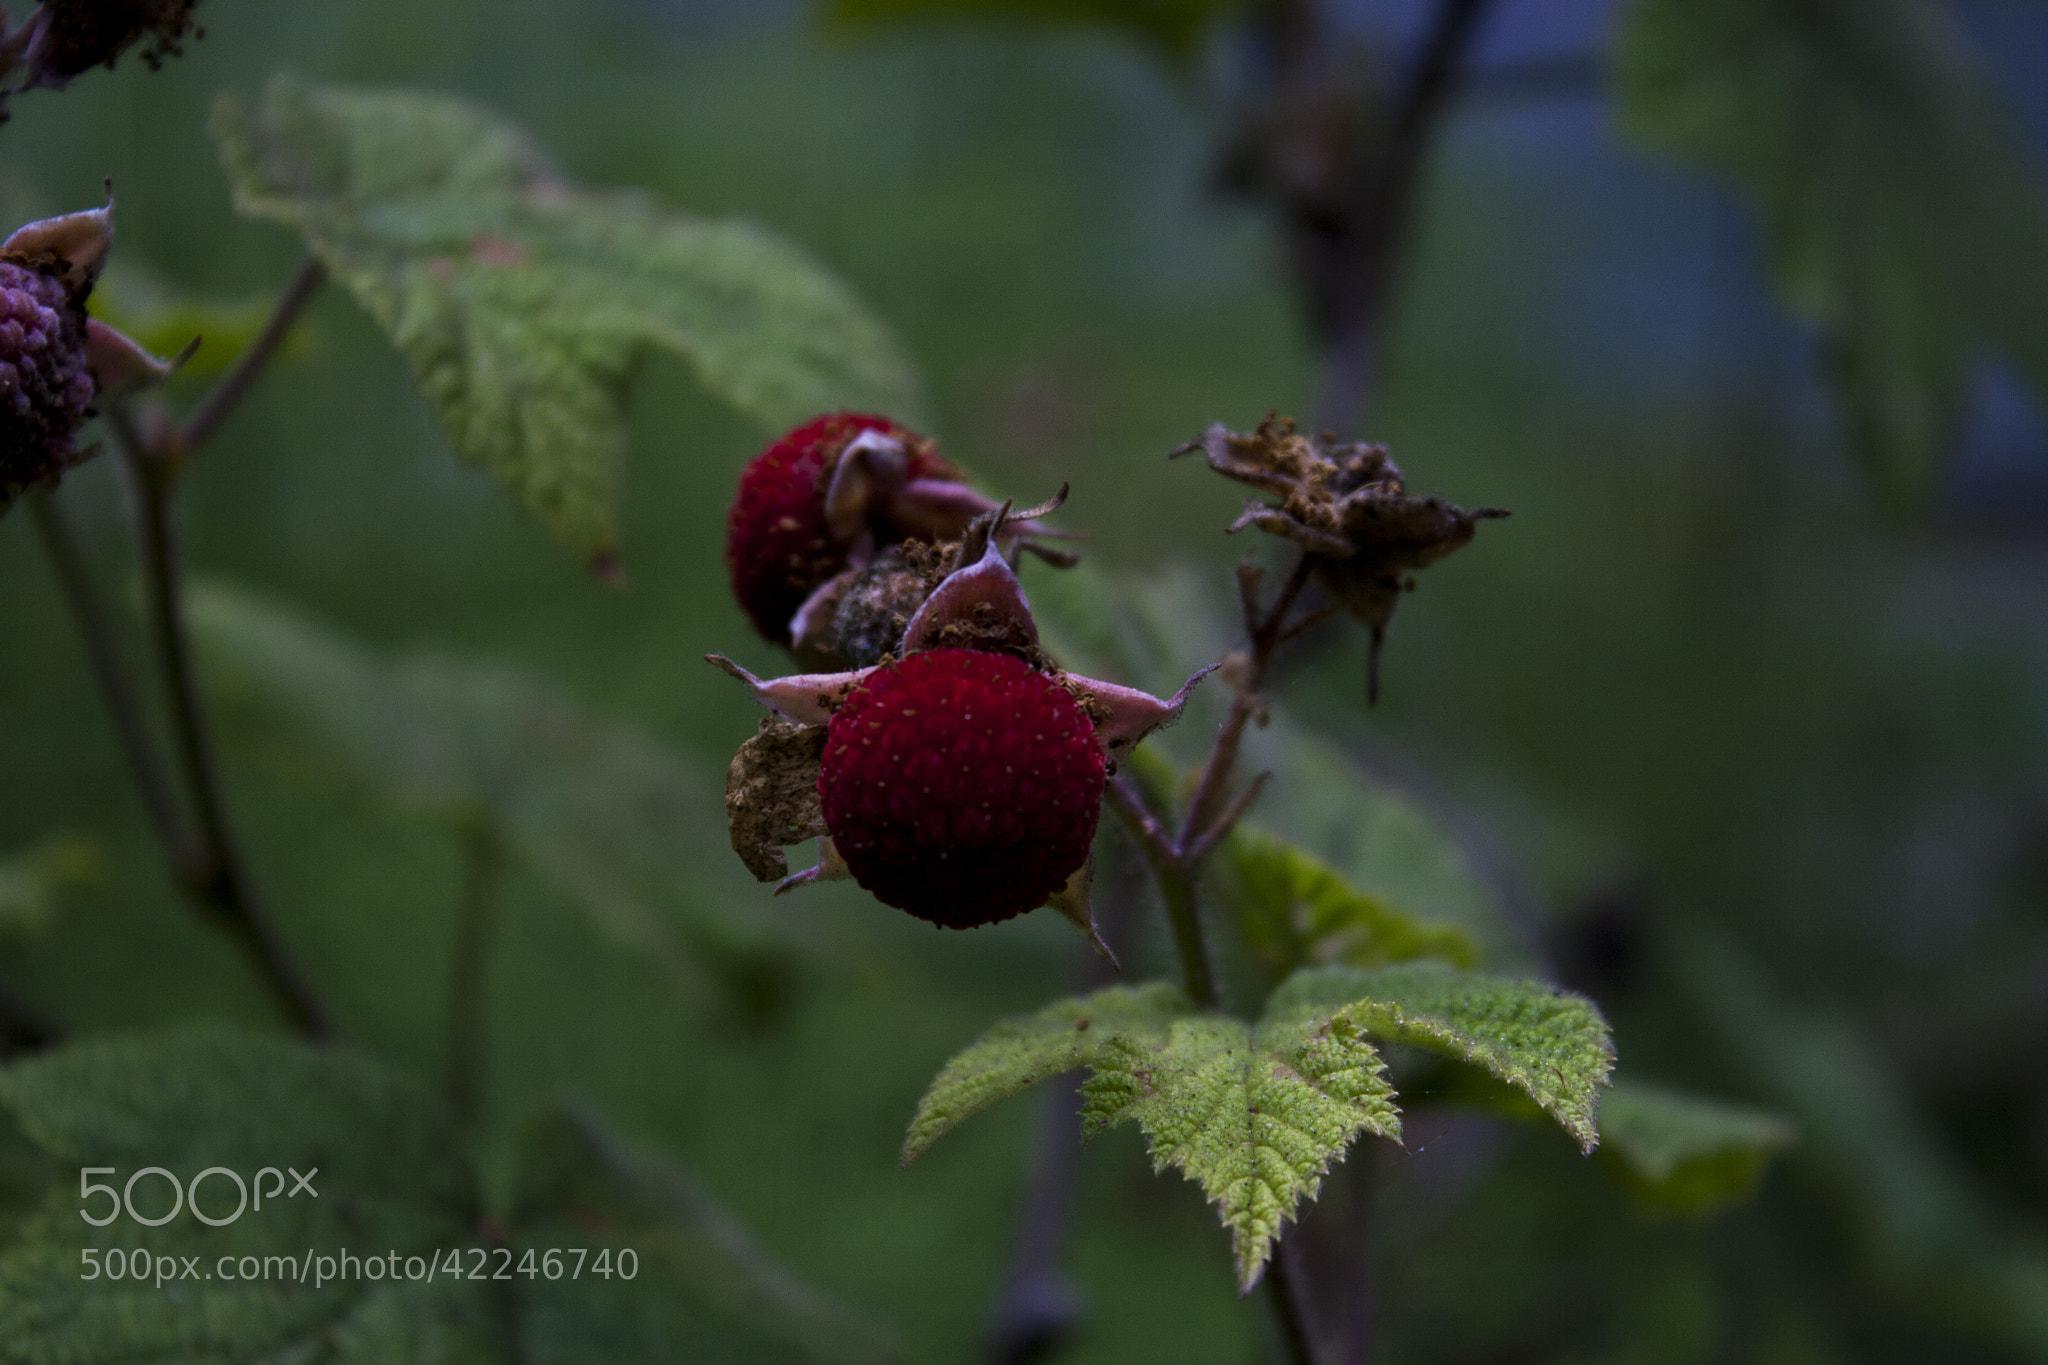 Photograph Wild raspberries by Kira Saprykina on 500px